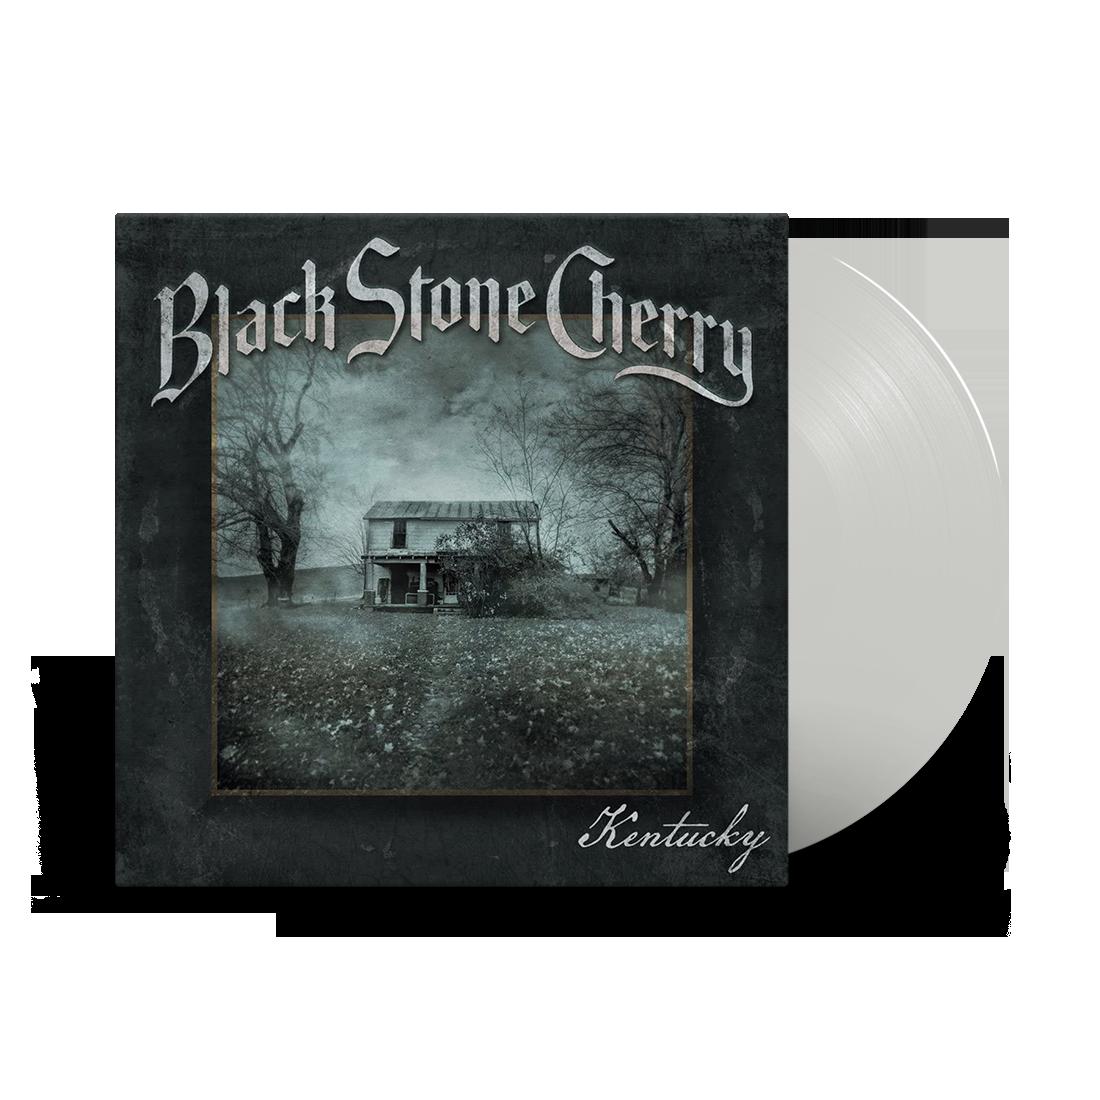 Black Stone Cherry - Kentucky Limited Edition Transparent Vinyl